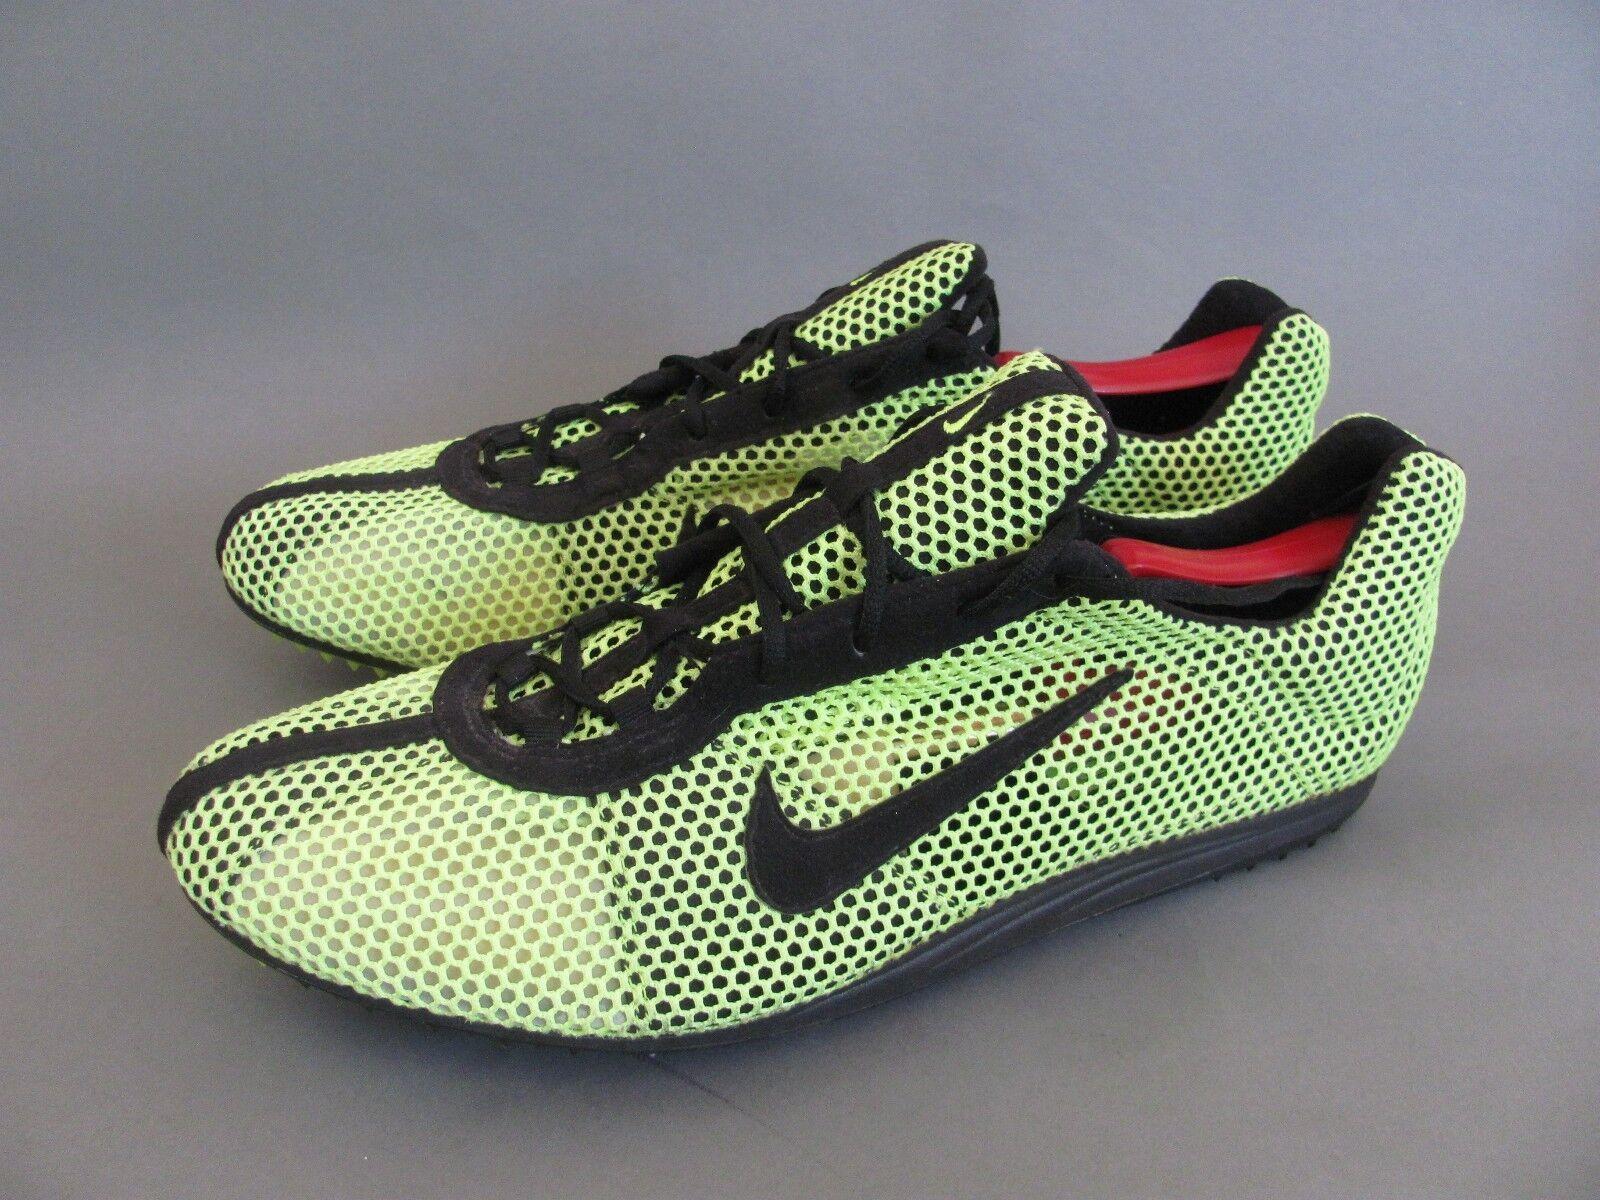 2002 Nike Zoom Bowerman Series Mesh Track Field Spike shoes, Men's US 13 NEW